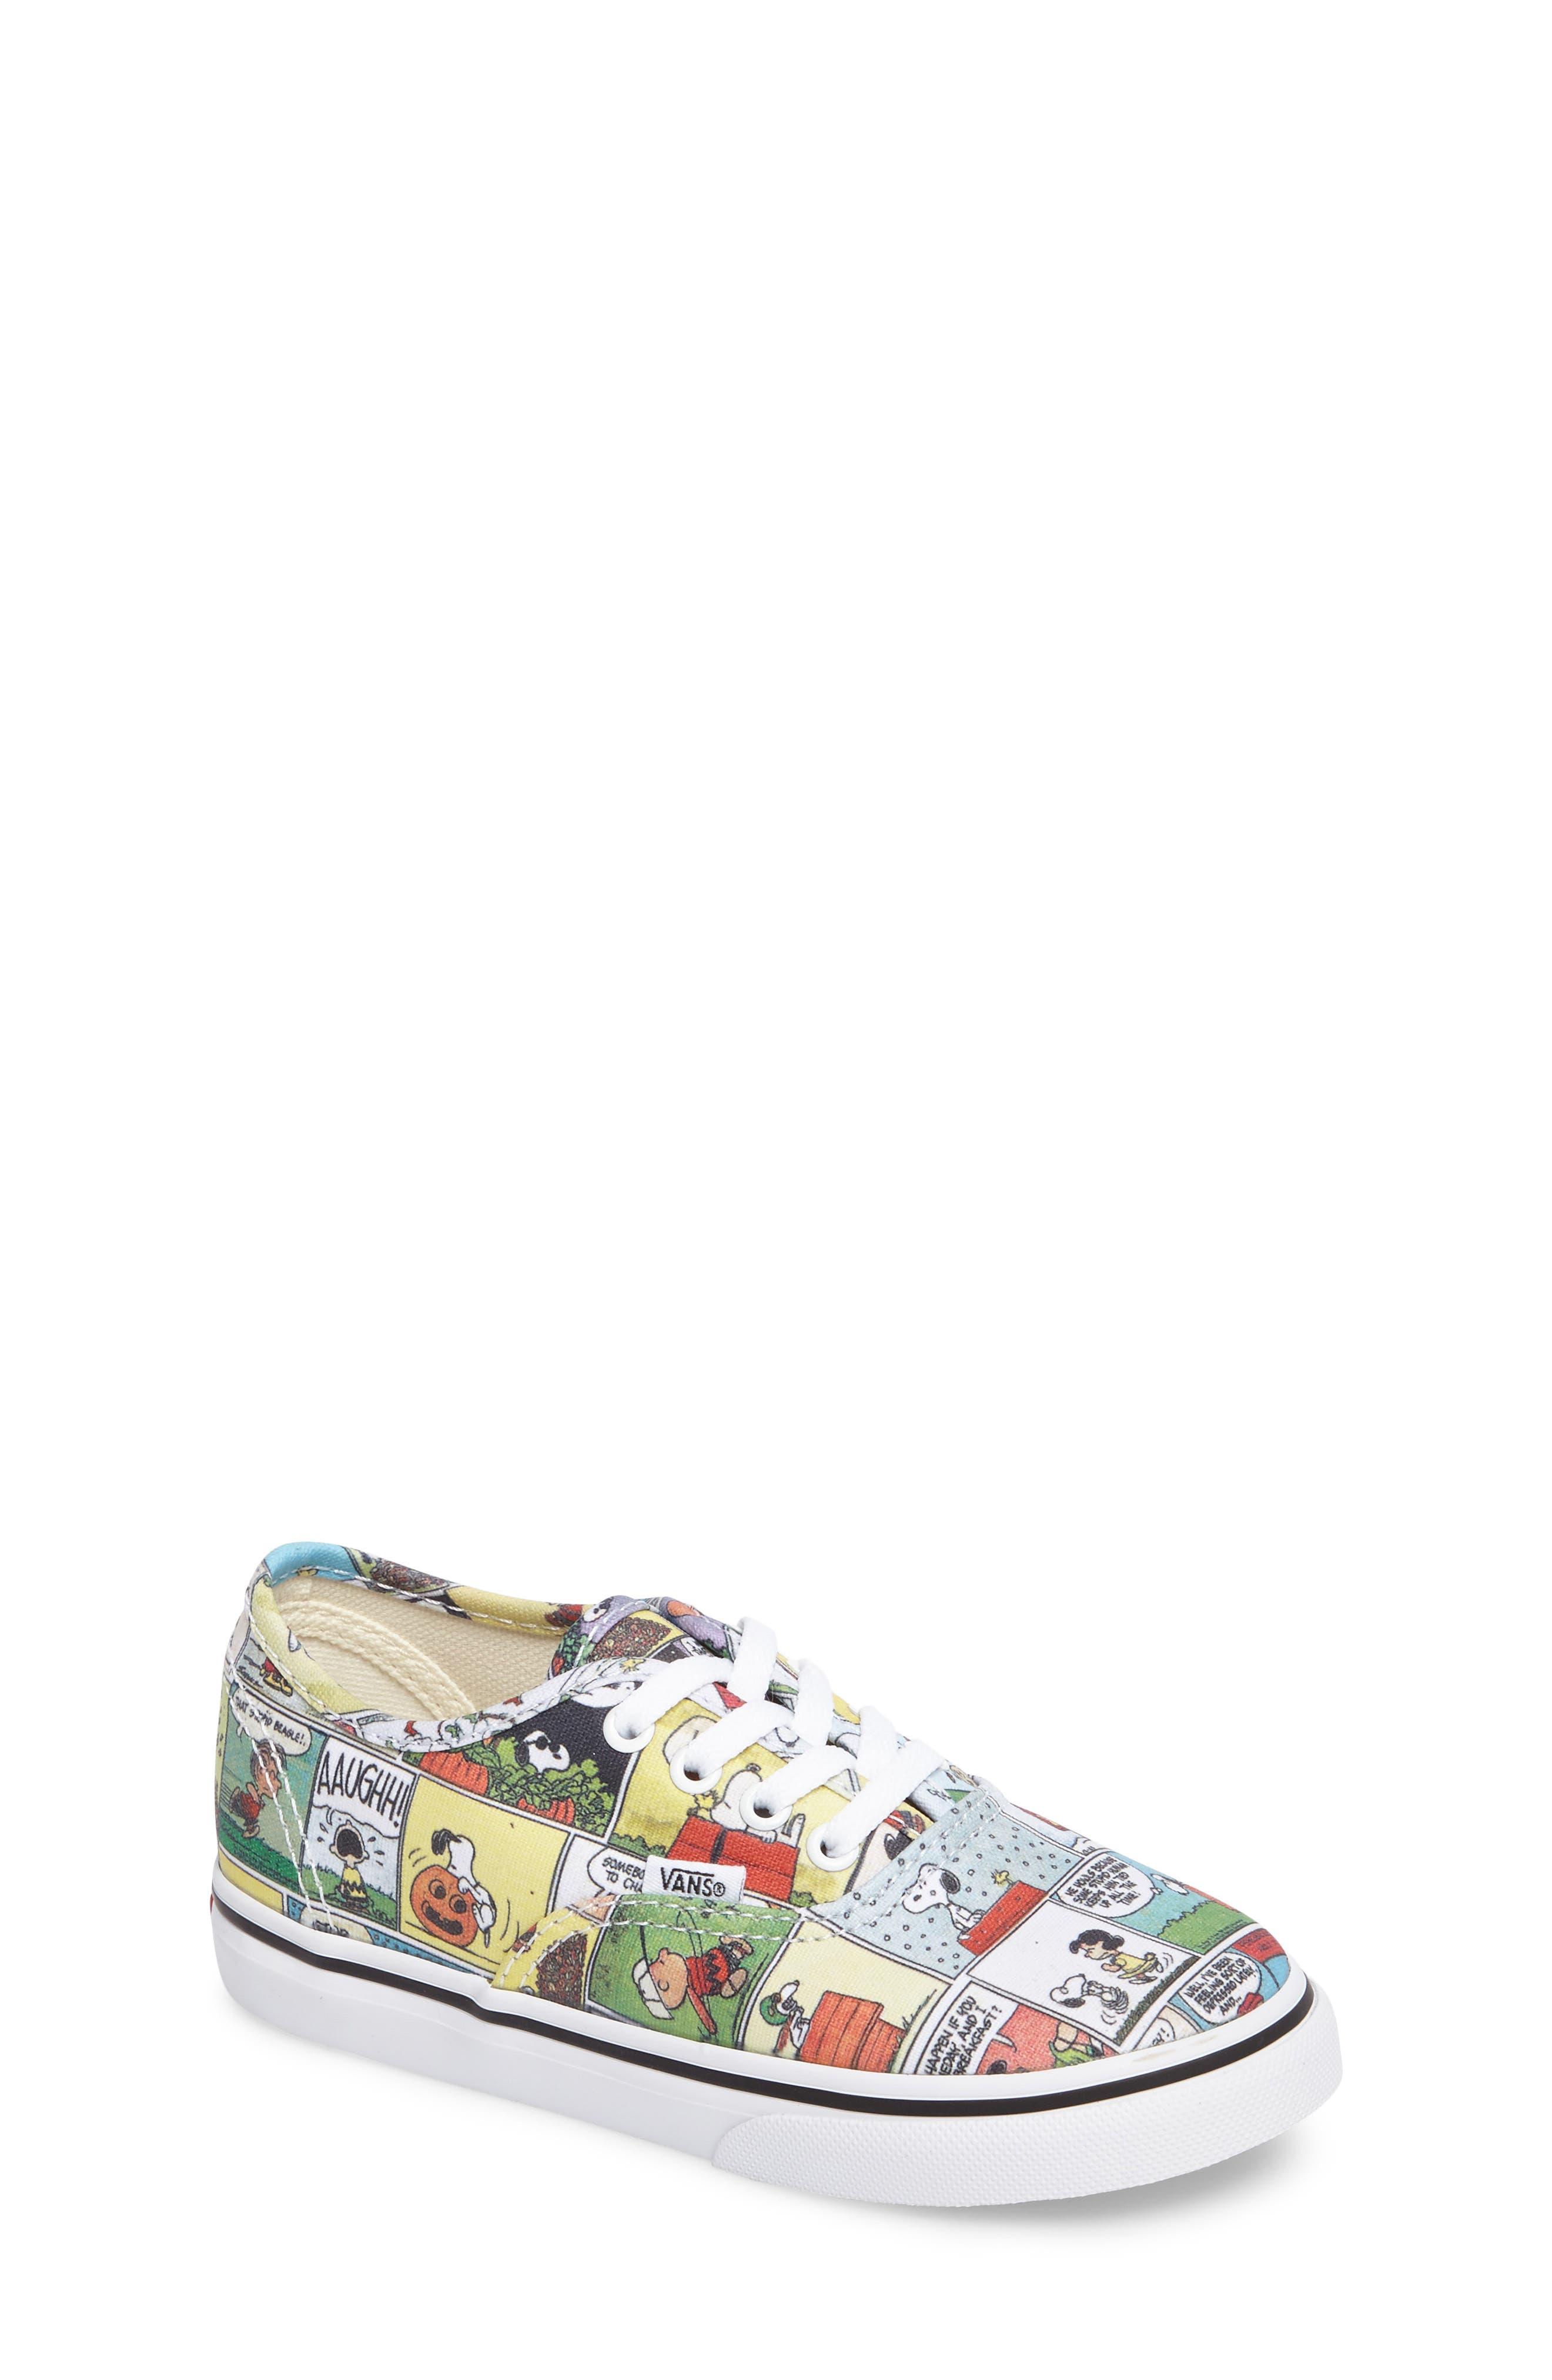 Main Image - Vans x Peanuts Authentic Low Top Sneaker (Baby, Walker, Toddler, Little Kid & Big Kid)